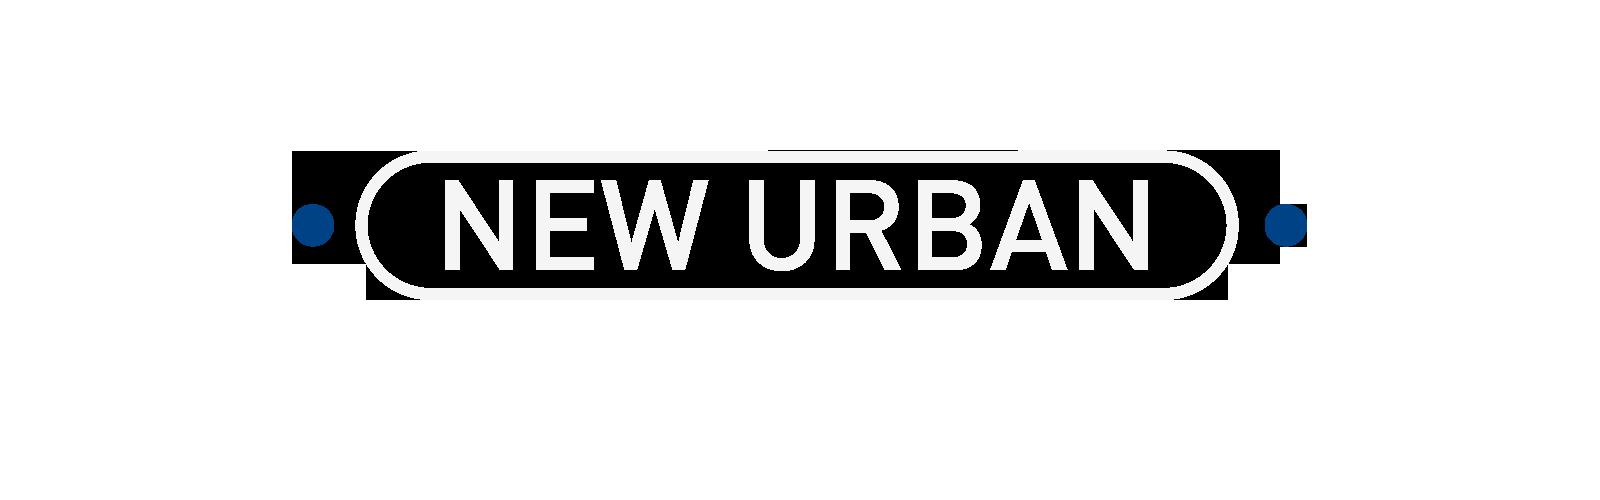 New Urban